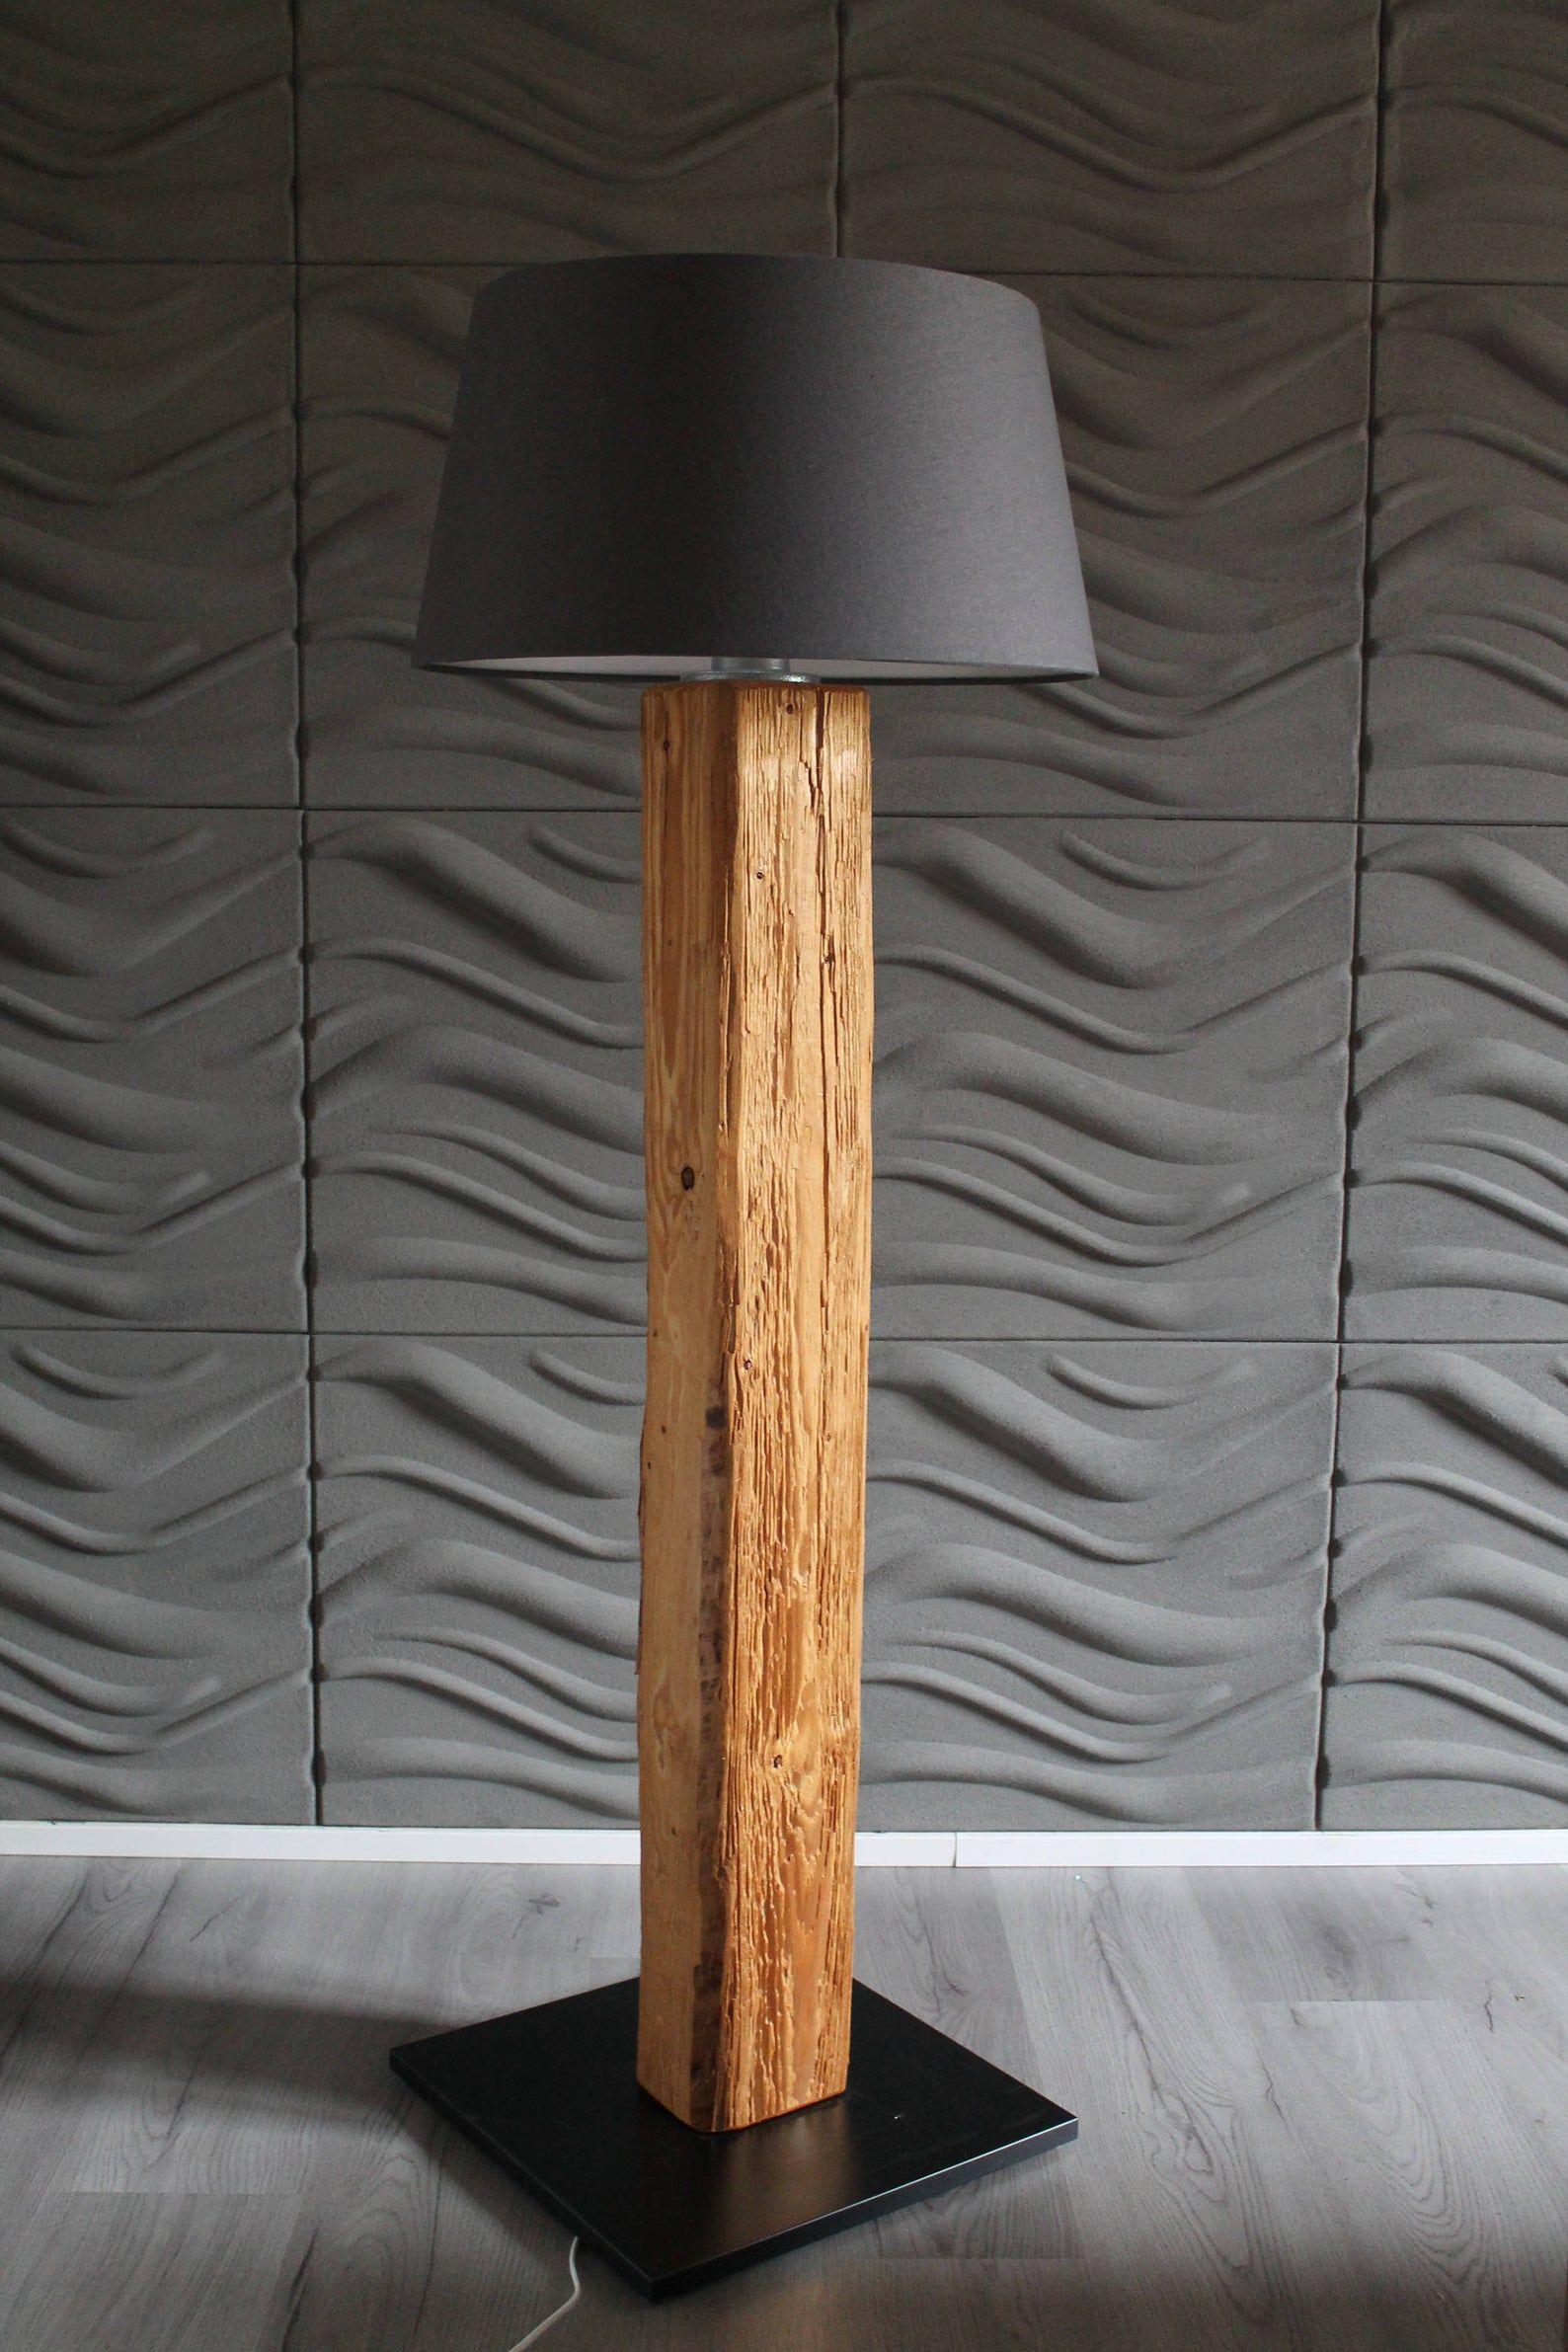 Floor Lamp Floor Lamp Lamp Lamp Floor Lamp Lamp Lampsande Wood Floor Lamp Room Lamp Floor Lamp Design